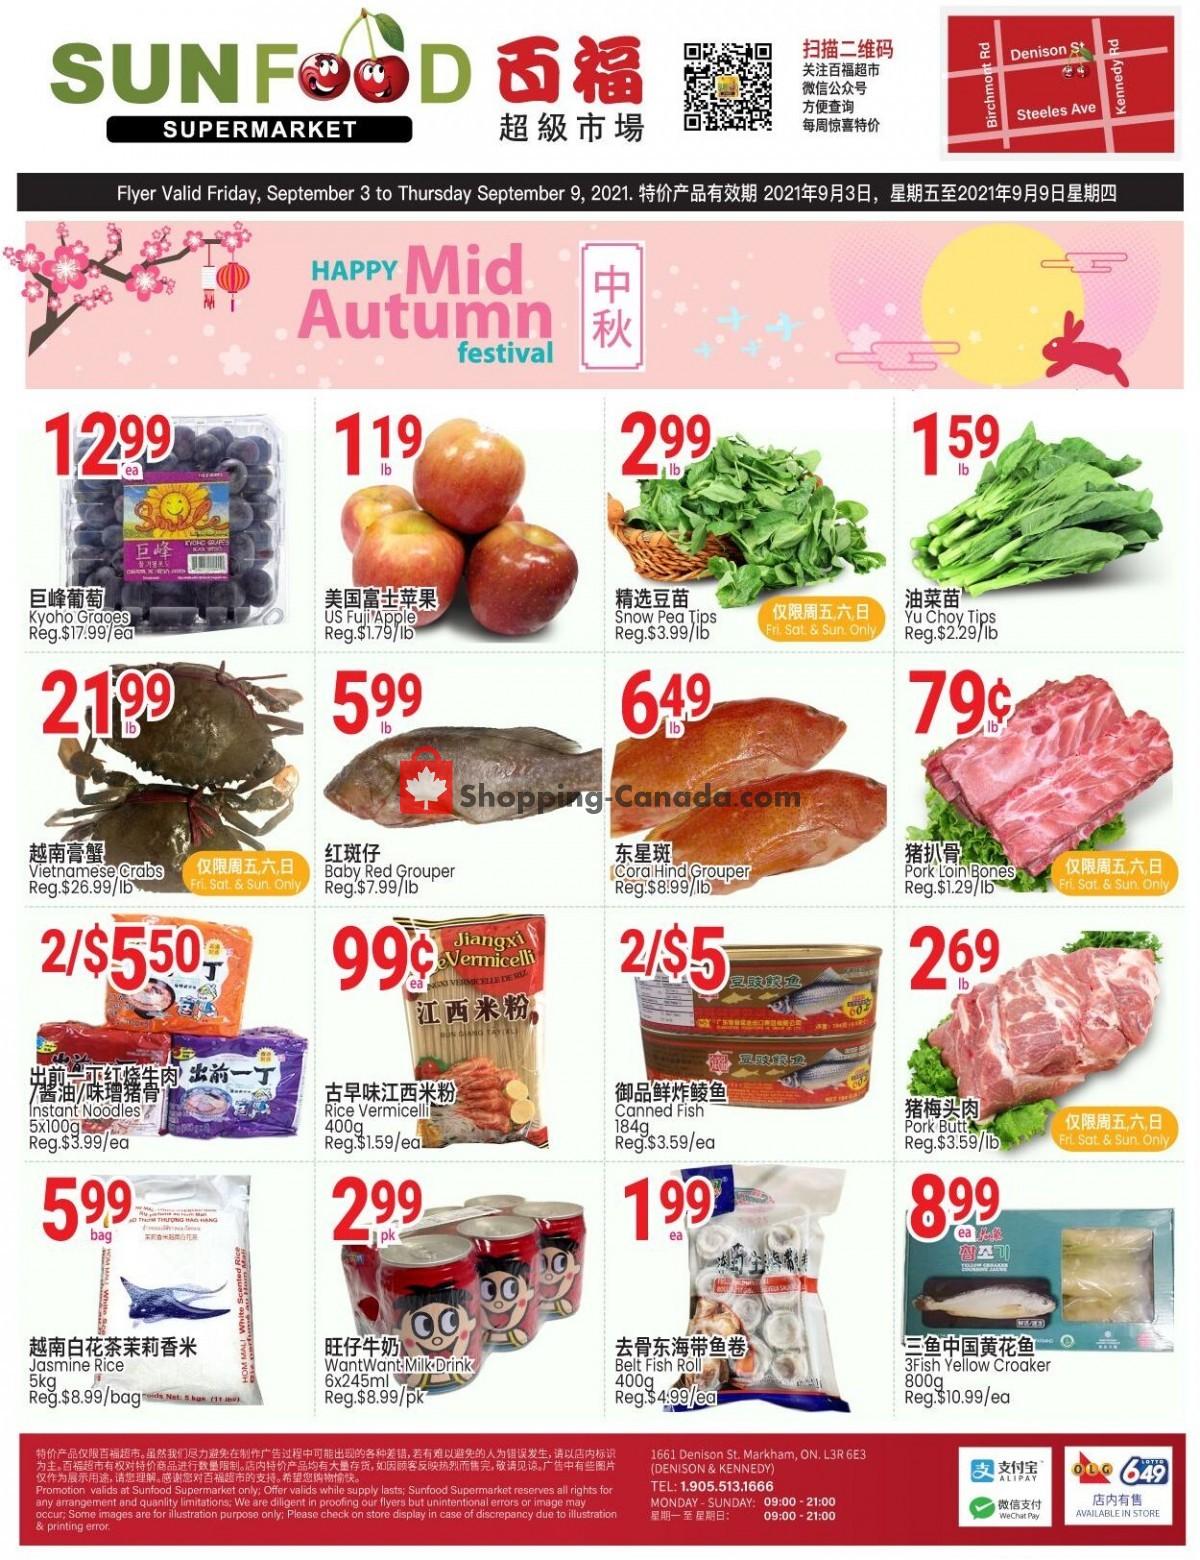 Flyer Sunfood Supermarket Canada - from Friday September 3, 2021 to Thursday September 9, 2021